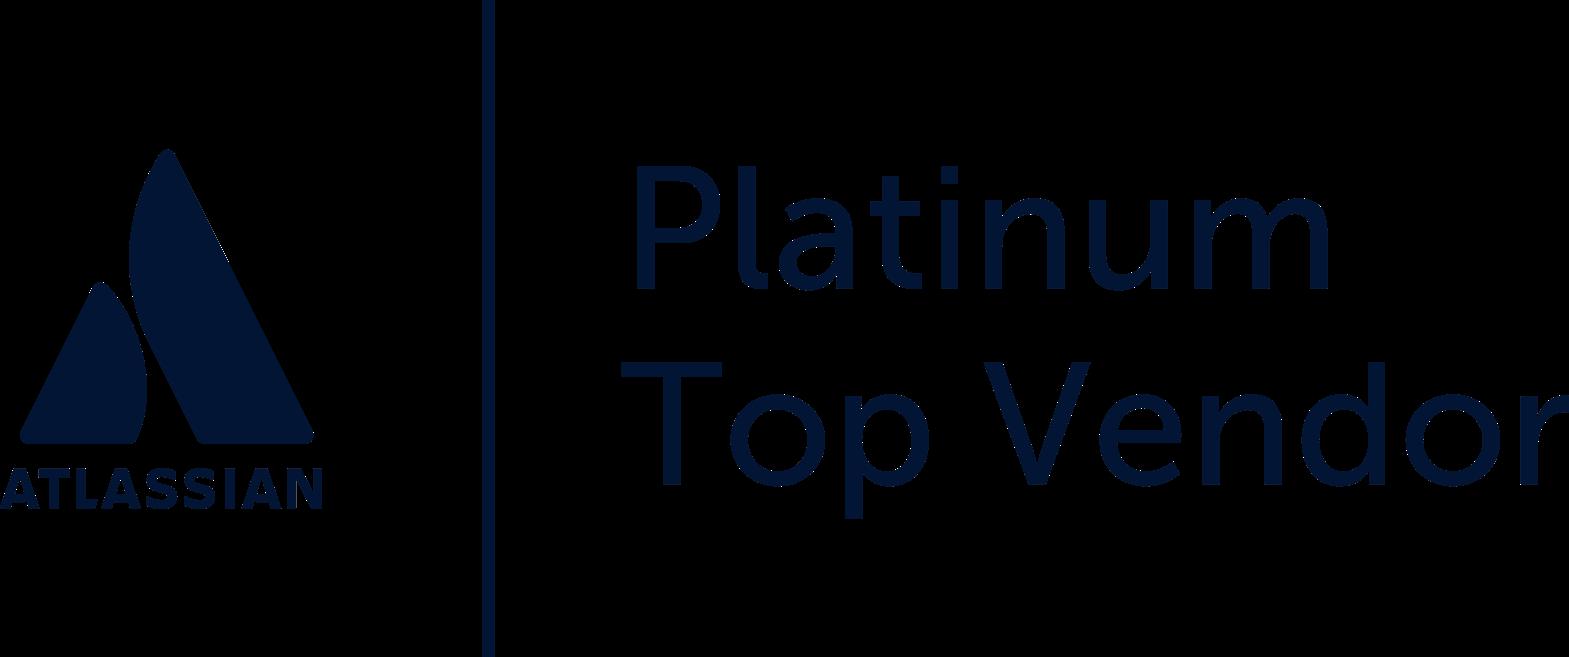 Atlassian platinum top vendor logo